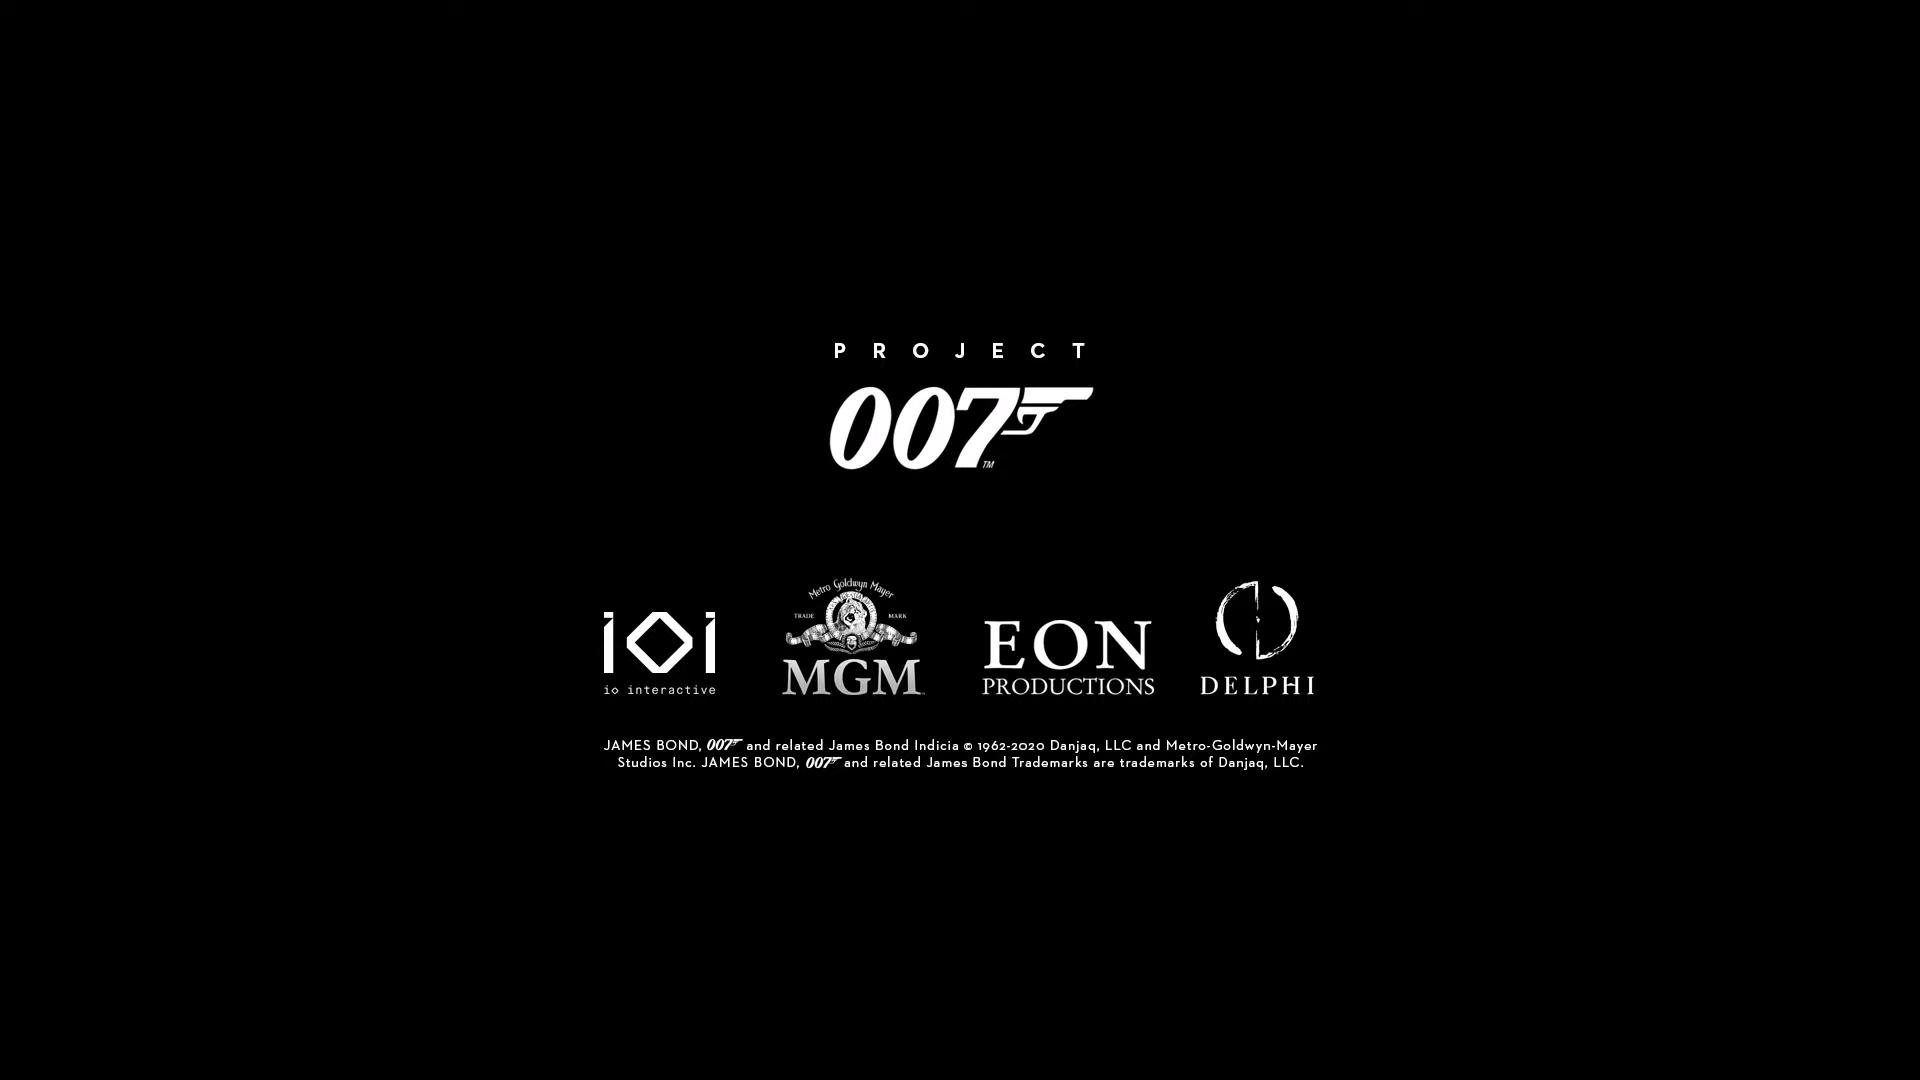 Project 007 - Hitman - ioi